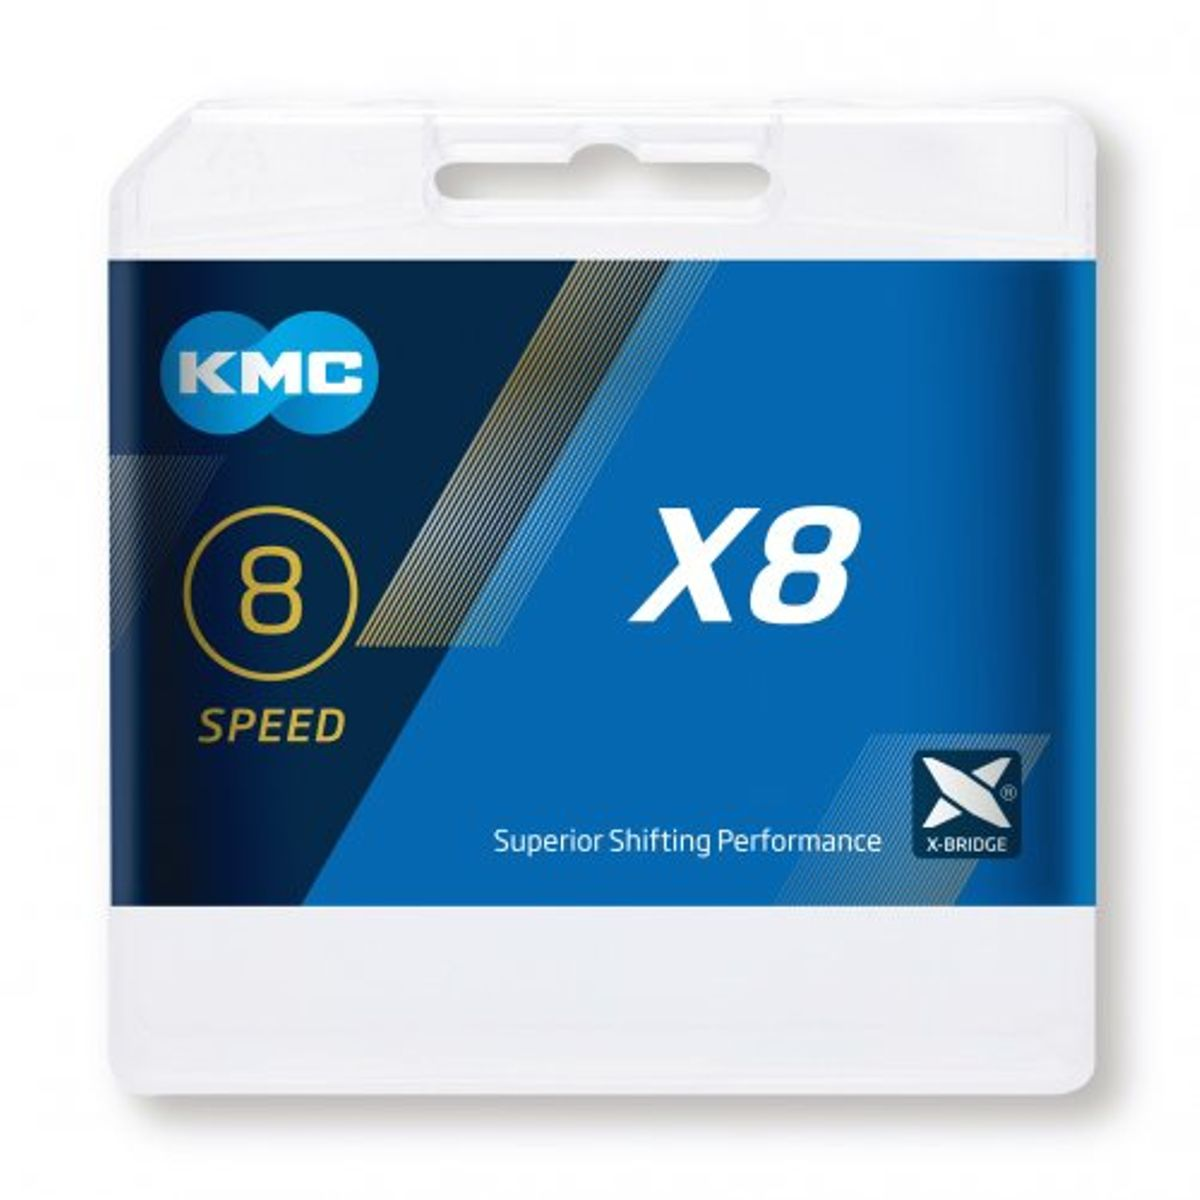 KETTING 7/8V 3/32 KMC X8 114 ZI/GRY